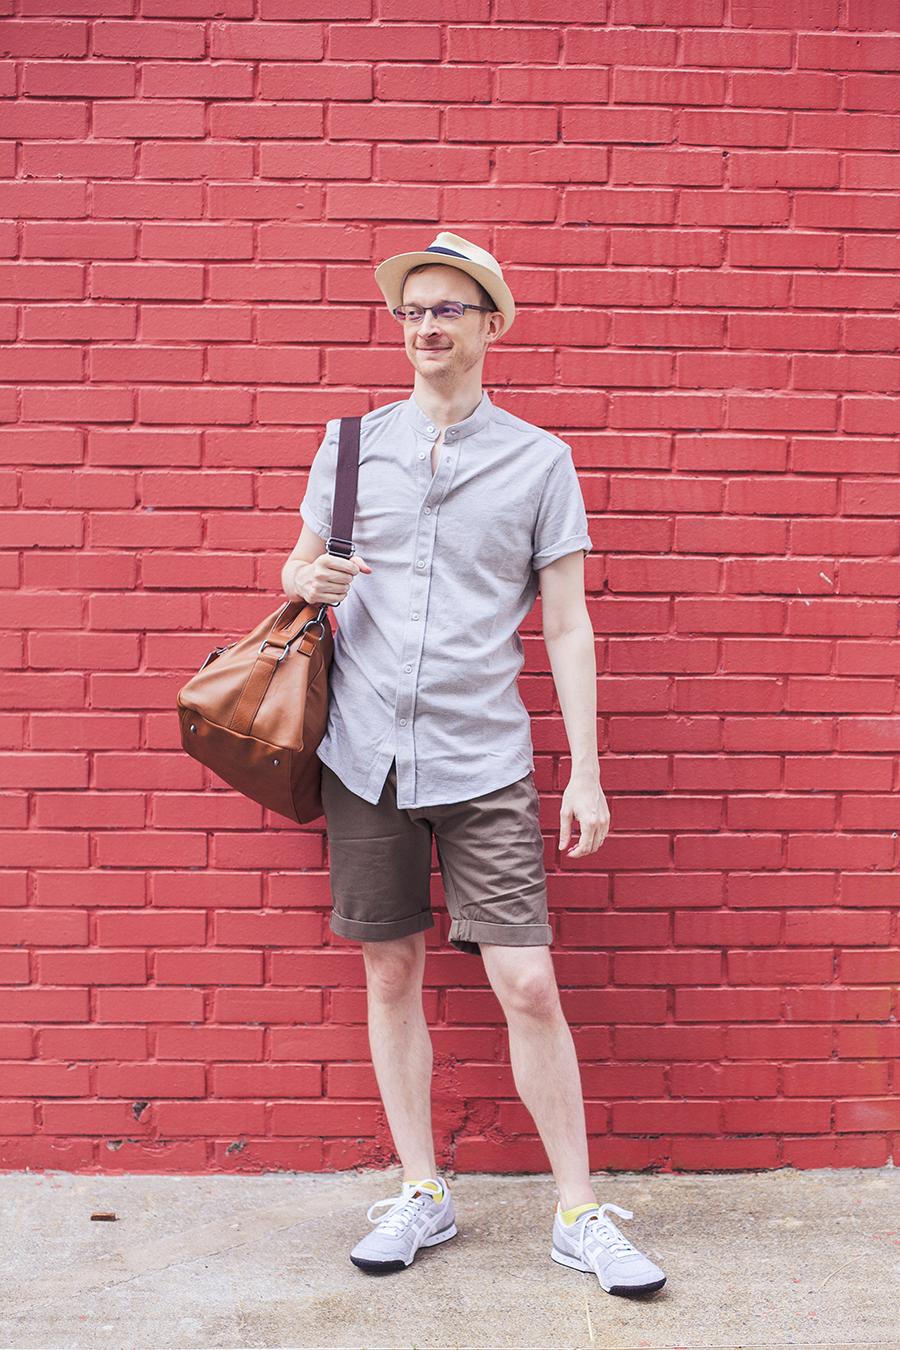 ThisGuyAh outfit: Zalora mandarin collar polo shirt, The Academy Branch shorts, ALDO duffle bag, Onitsuka Tiger sneakers.